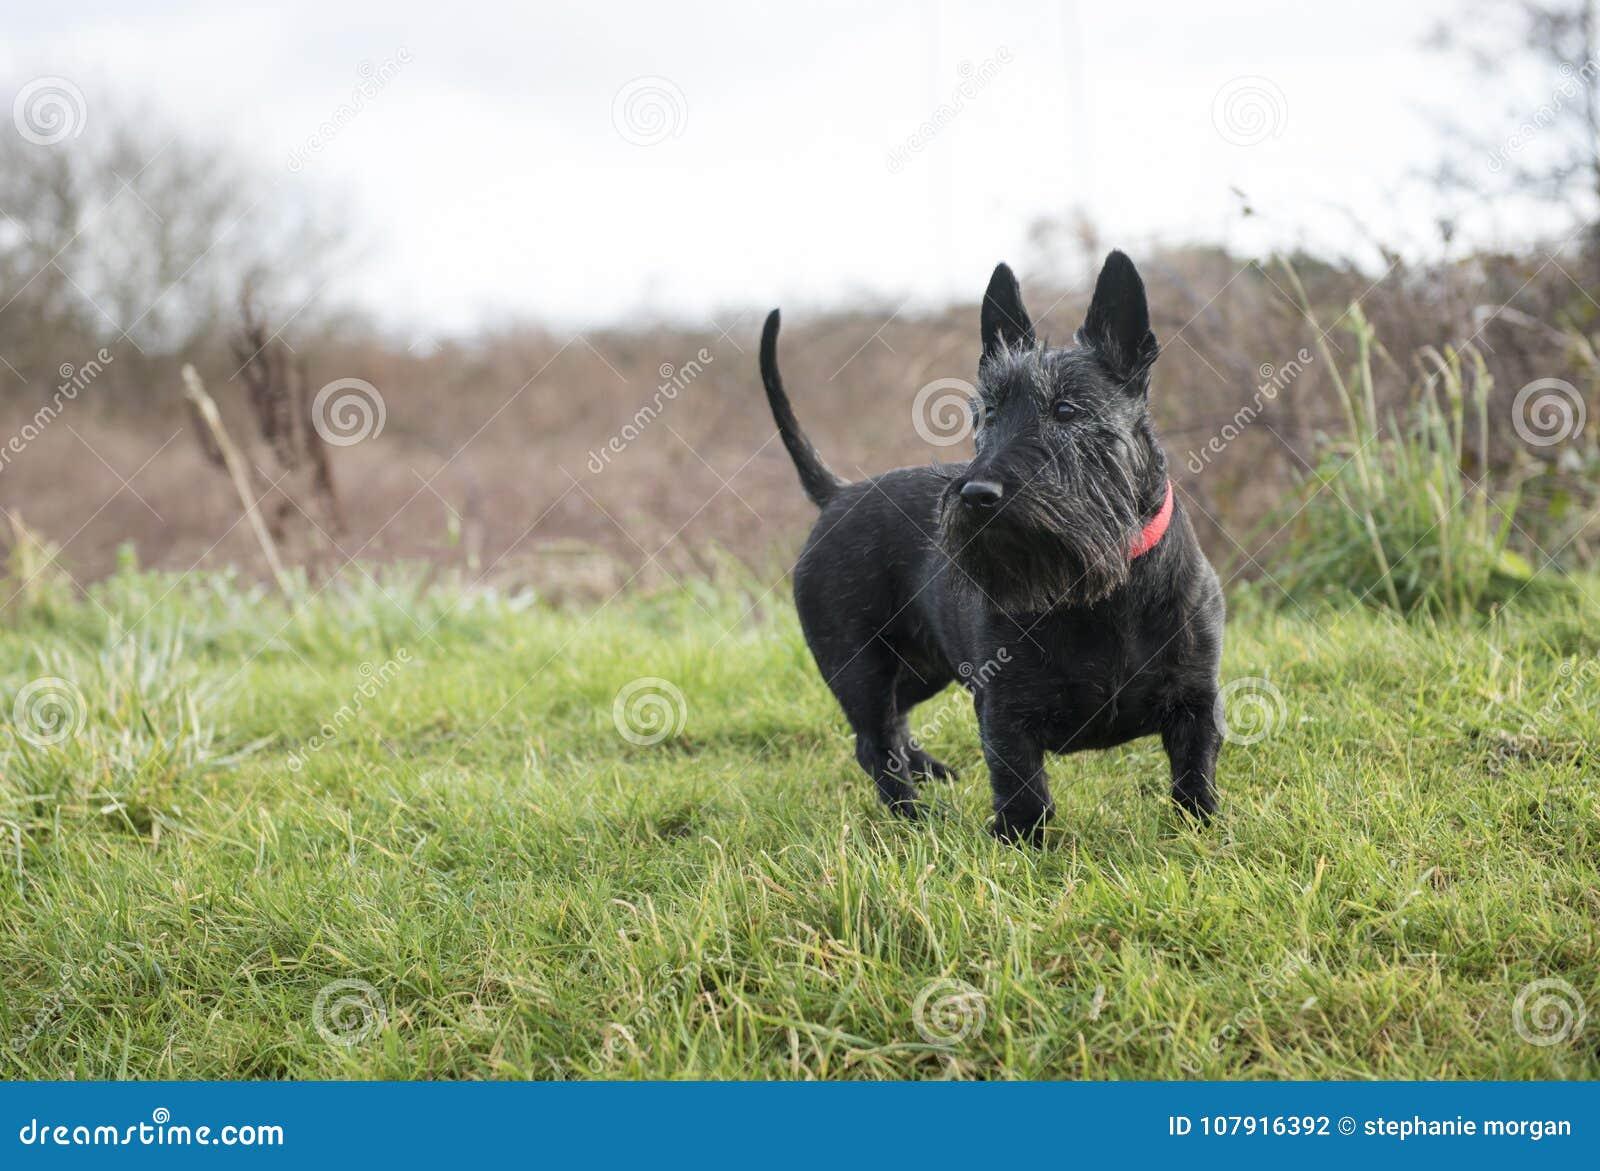 Cute black Scottish Terrier dog on green grass